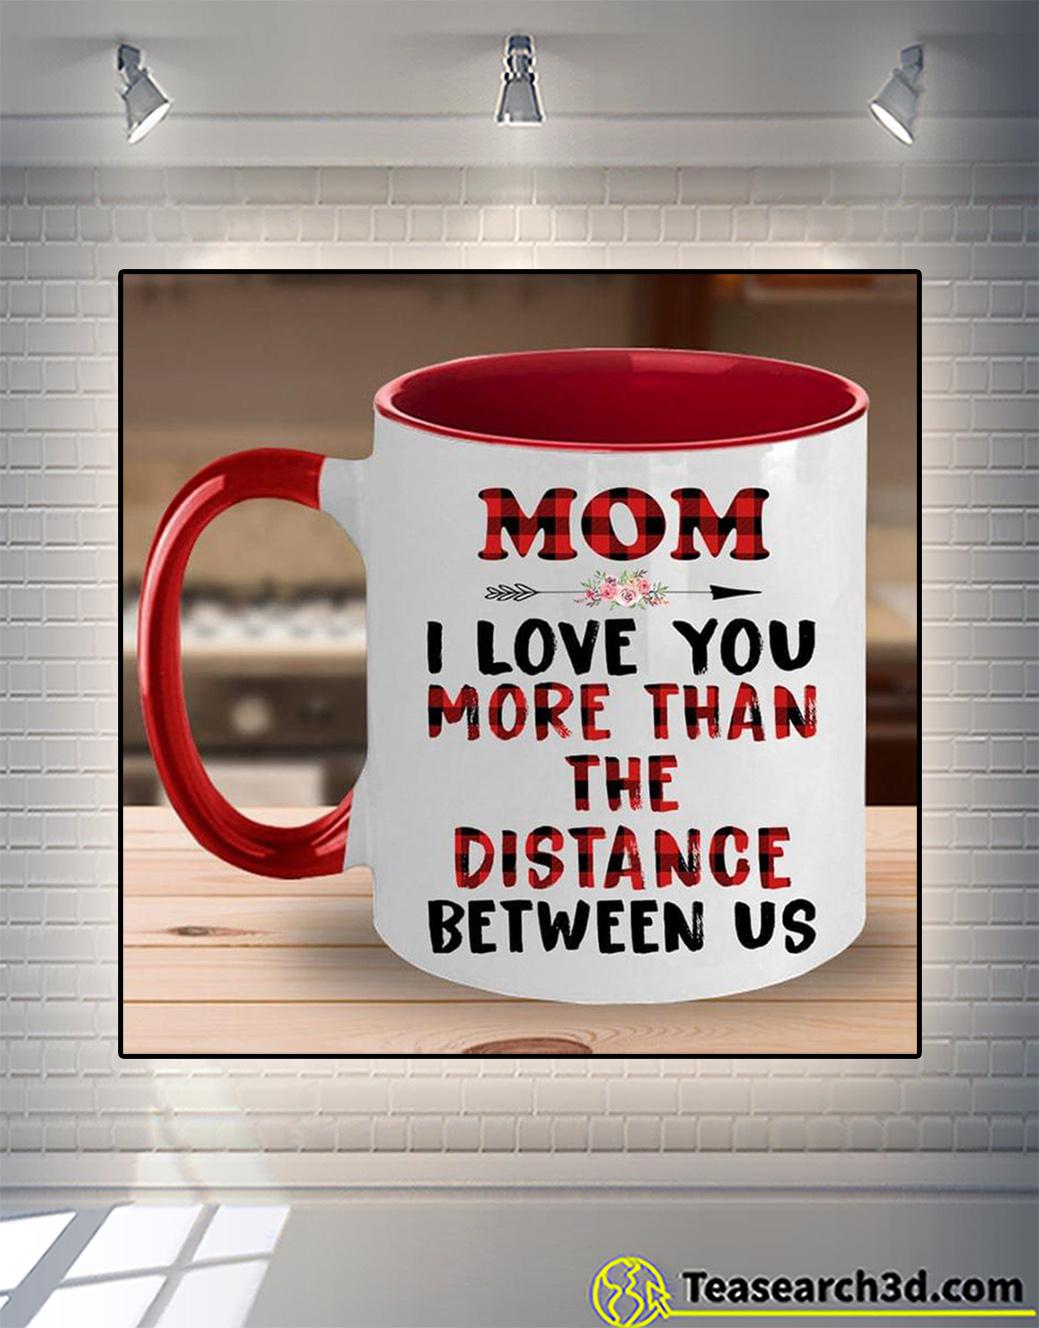 Mom I love you more than the distance between us mug 11oz